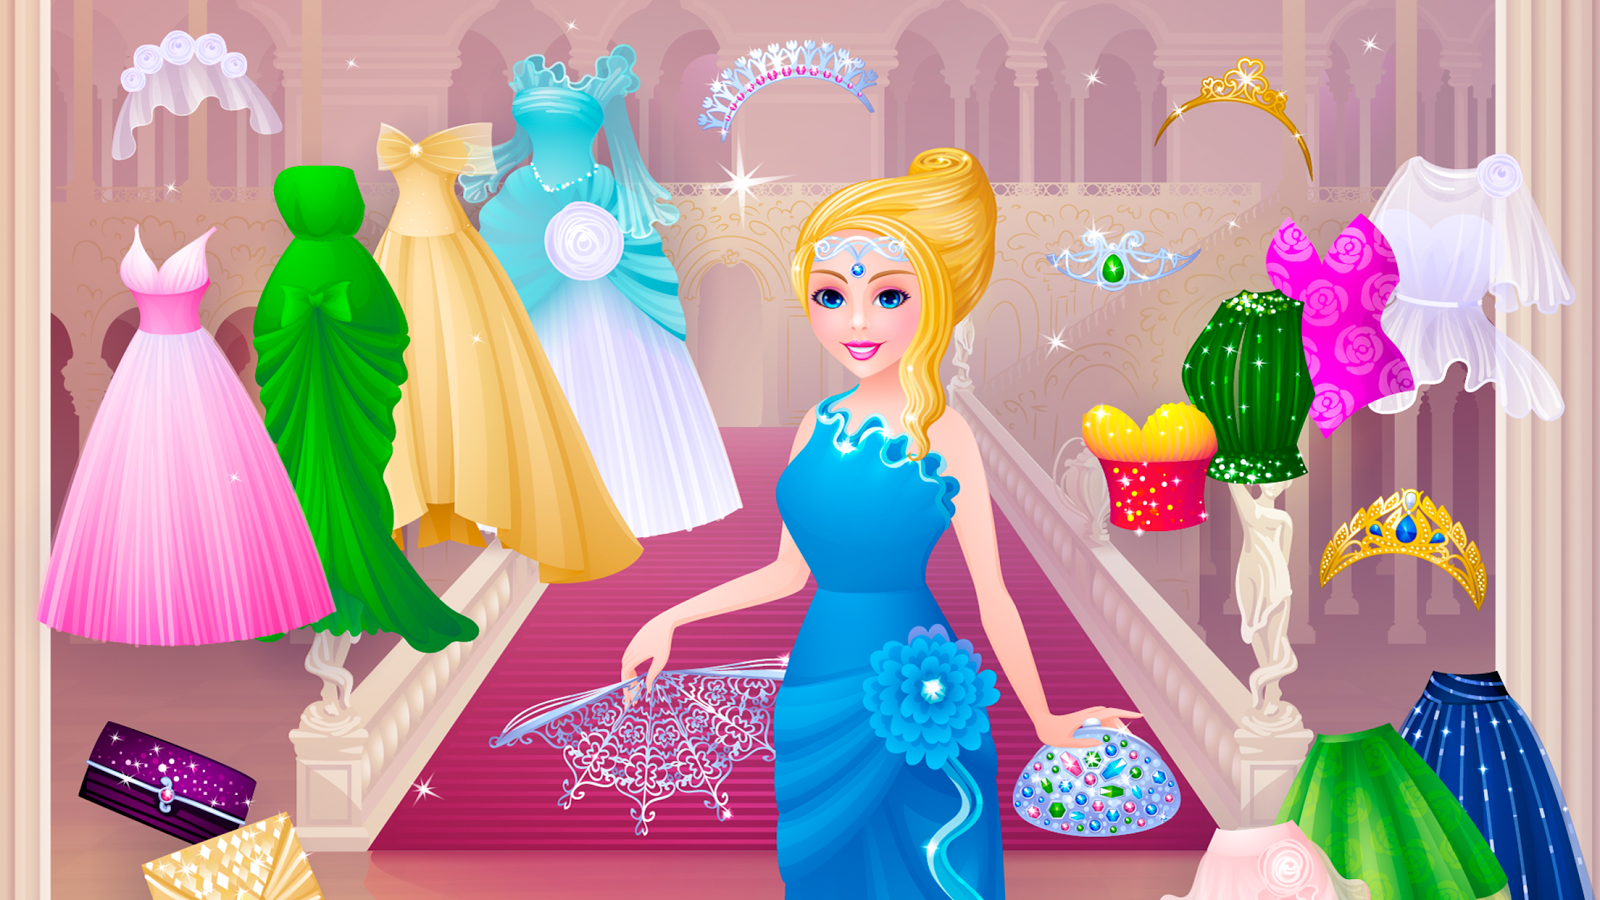 Dress up of cinderella - Cinderella Dress Up Screenshot